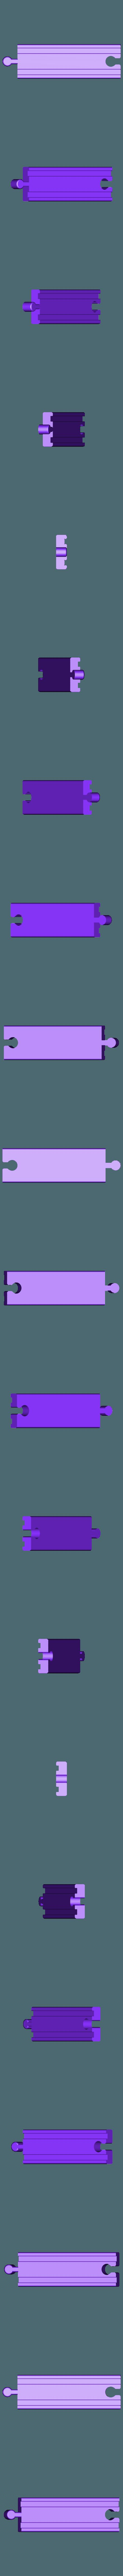 Straight Long Track.stl Download free STL file Toy Train Tracks • 3D printer design, FerryTeacher